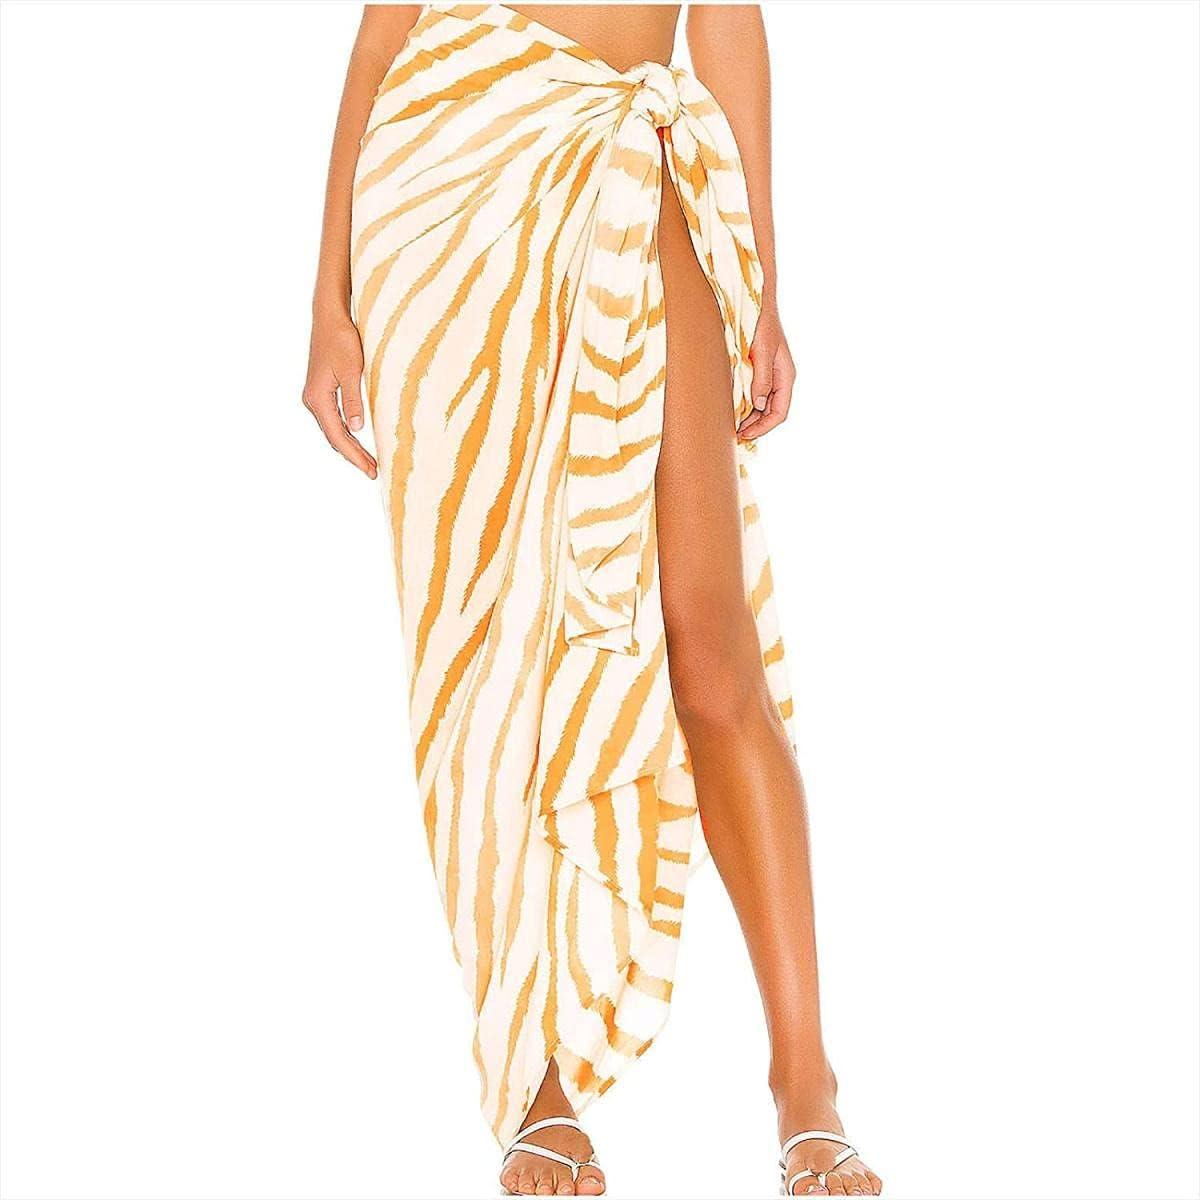 JNBGYAPS Woman Dress Work,Women Printed Swimsuit Cover Up Mesh Bikini Swimwear Beach Cover-Ups Wrap Skirt Woman Skirt for Easter Yellow